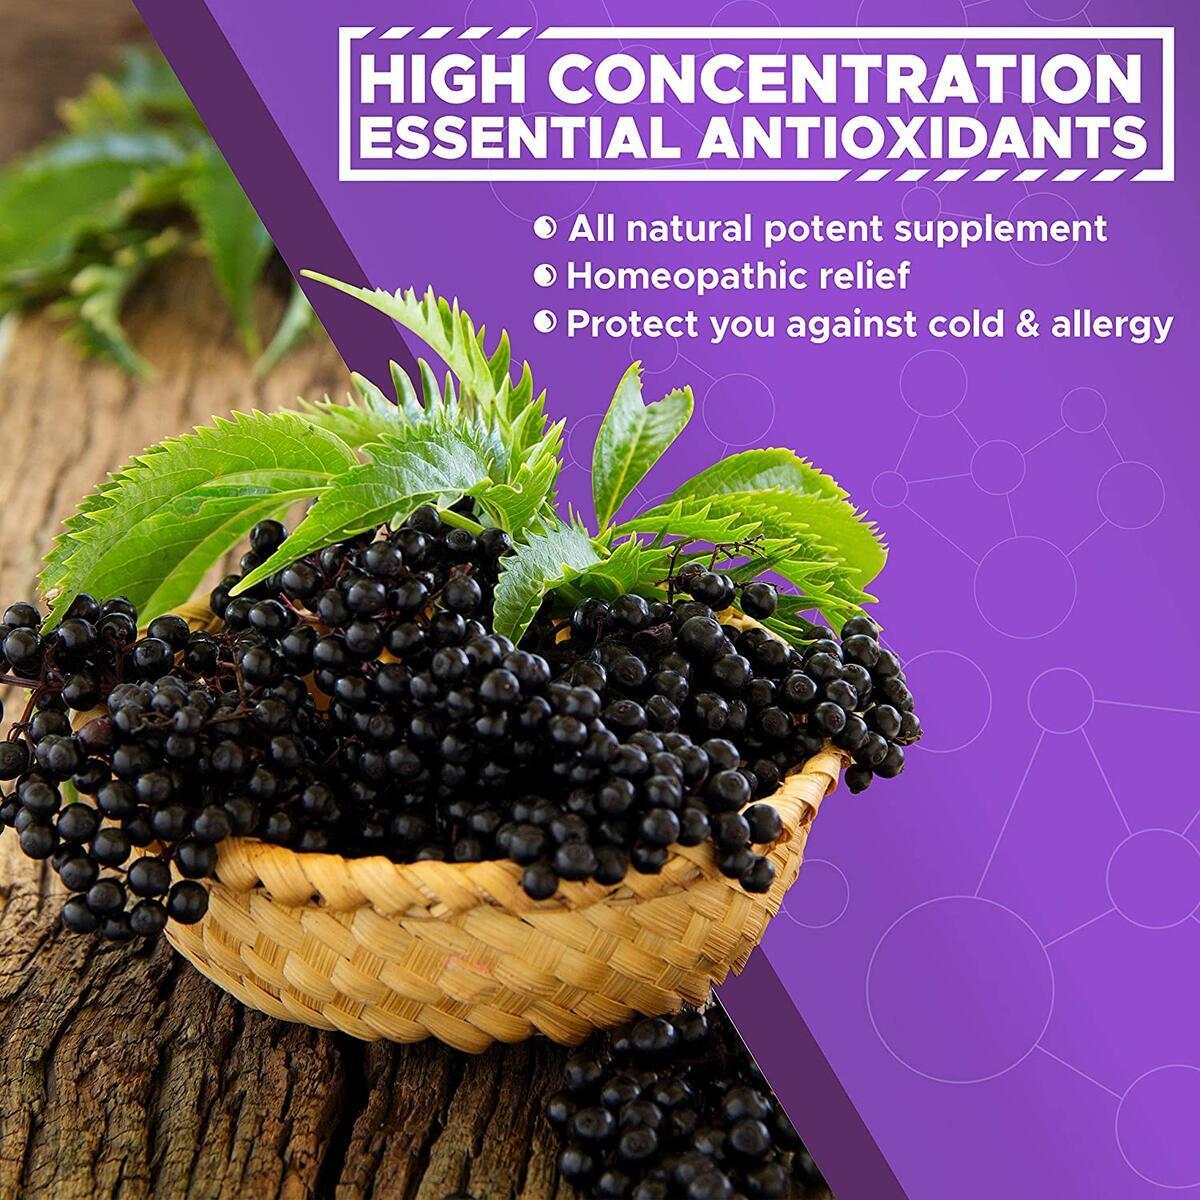 VITBOOST Extra Strength Vegan 200mg Organic Elderberry Syrup | Immune Support for Kids & Adults | Antioxidant Supplement (2oz, 30-Day Supply) Berry Flavor Sambucus Elderberry Liquid Extract Drops